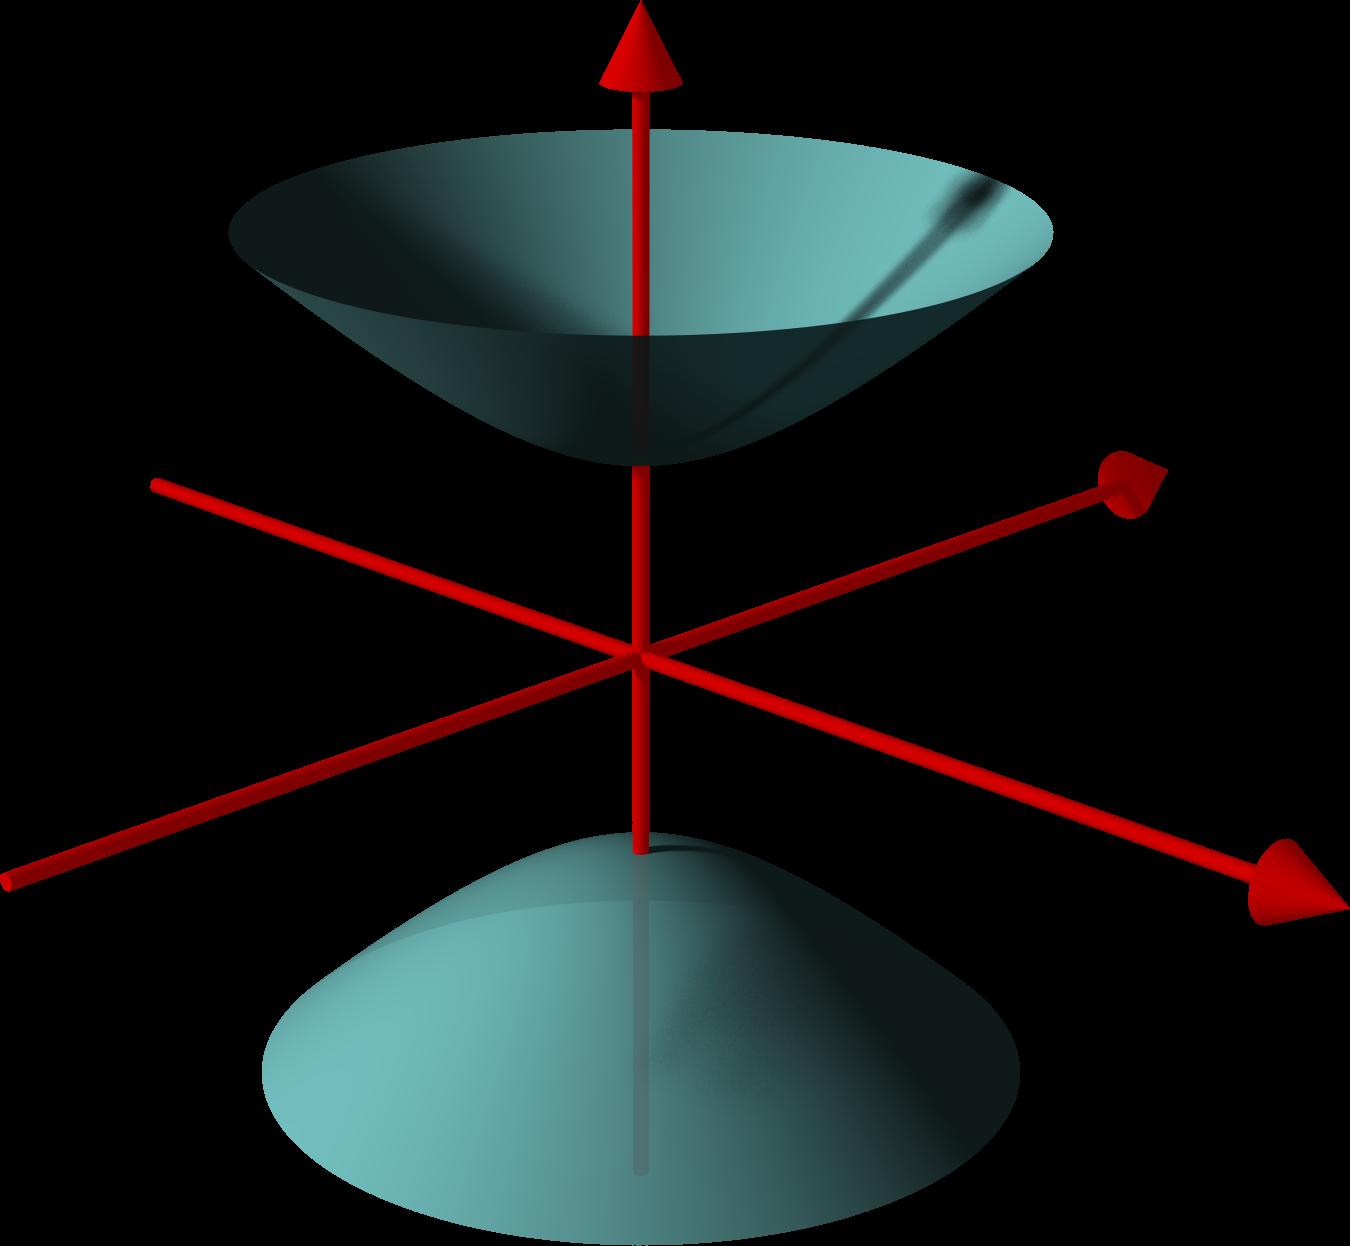 hyperboloid2.png